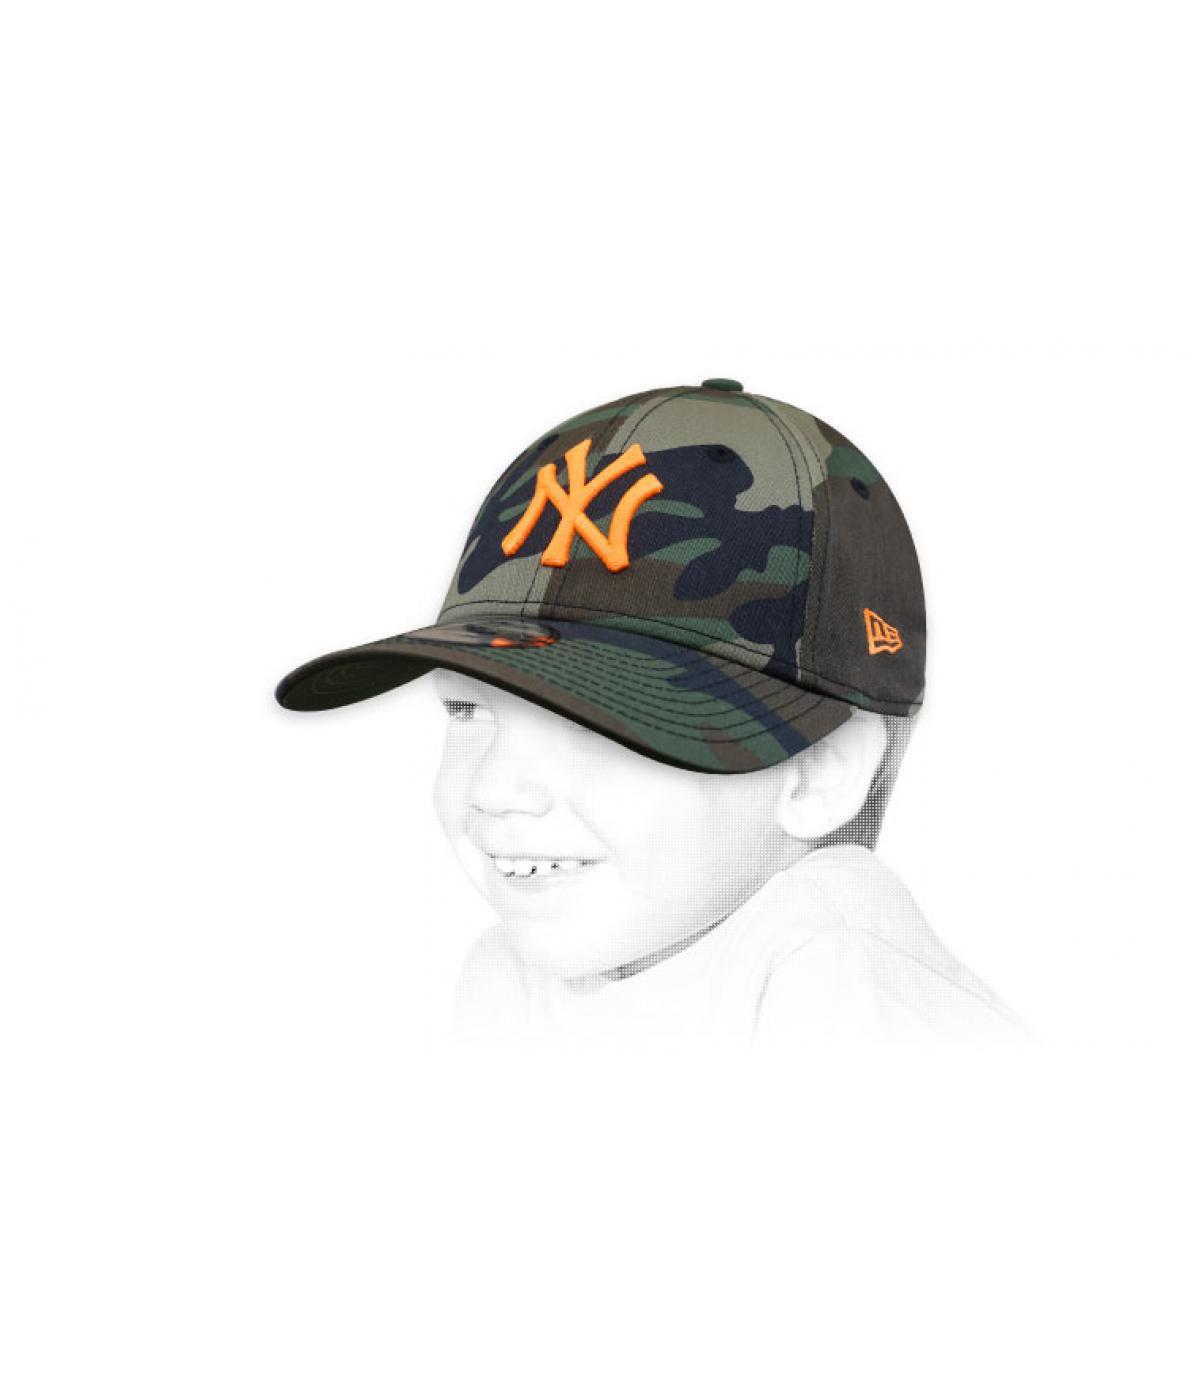 gorra niño NY camuflaje